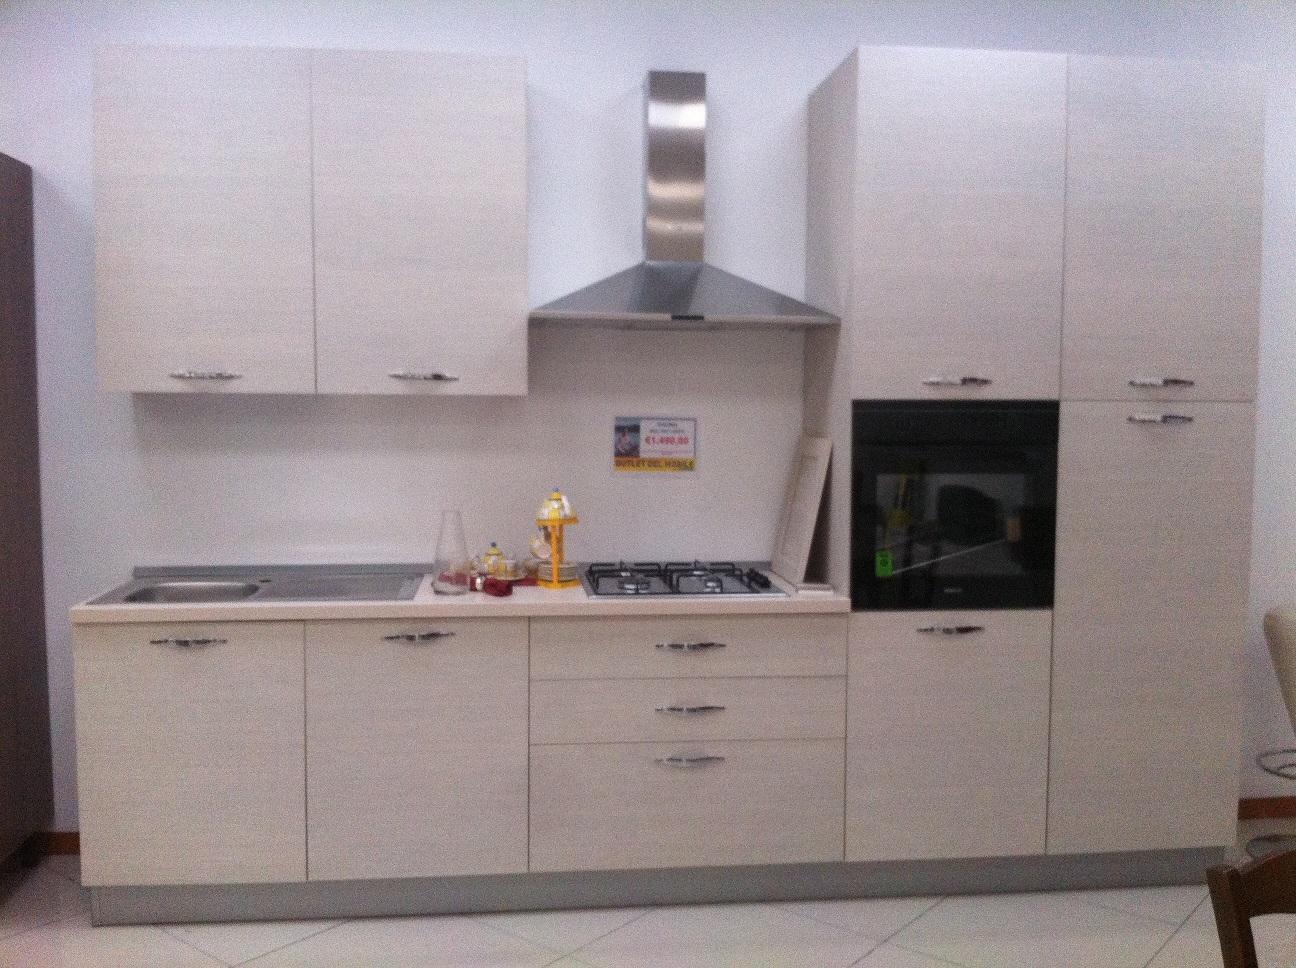 Net Cucine Cucina Giò larice scontato del -50 % - Cucine a prezzi ...